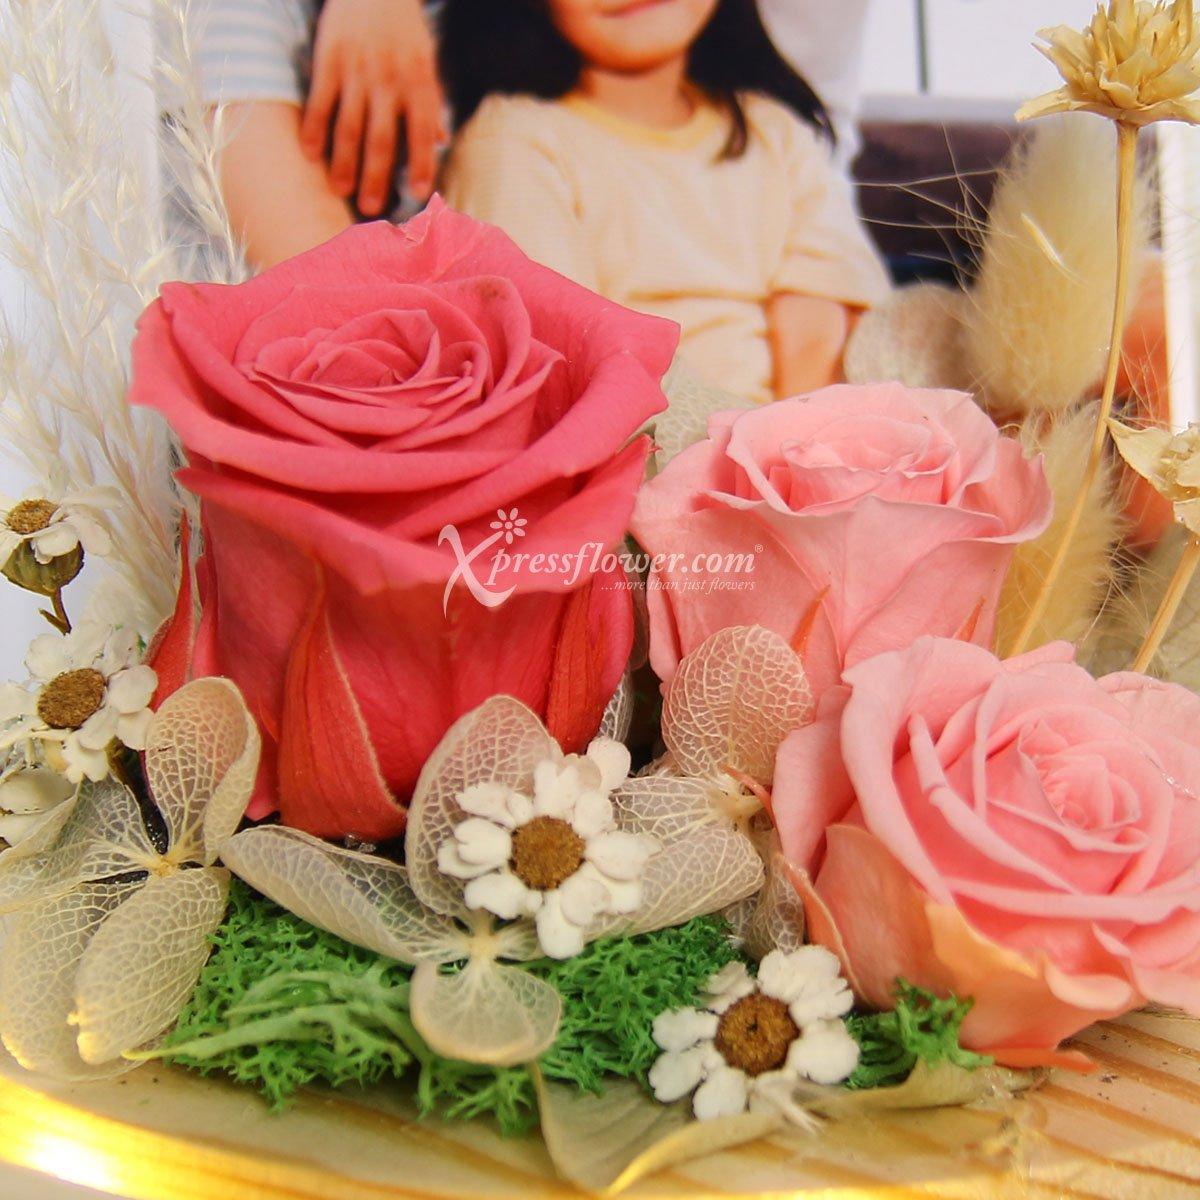 PR2123 Preserved Roses Photo Dome